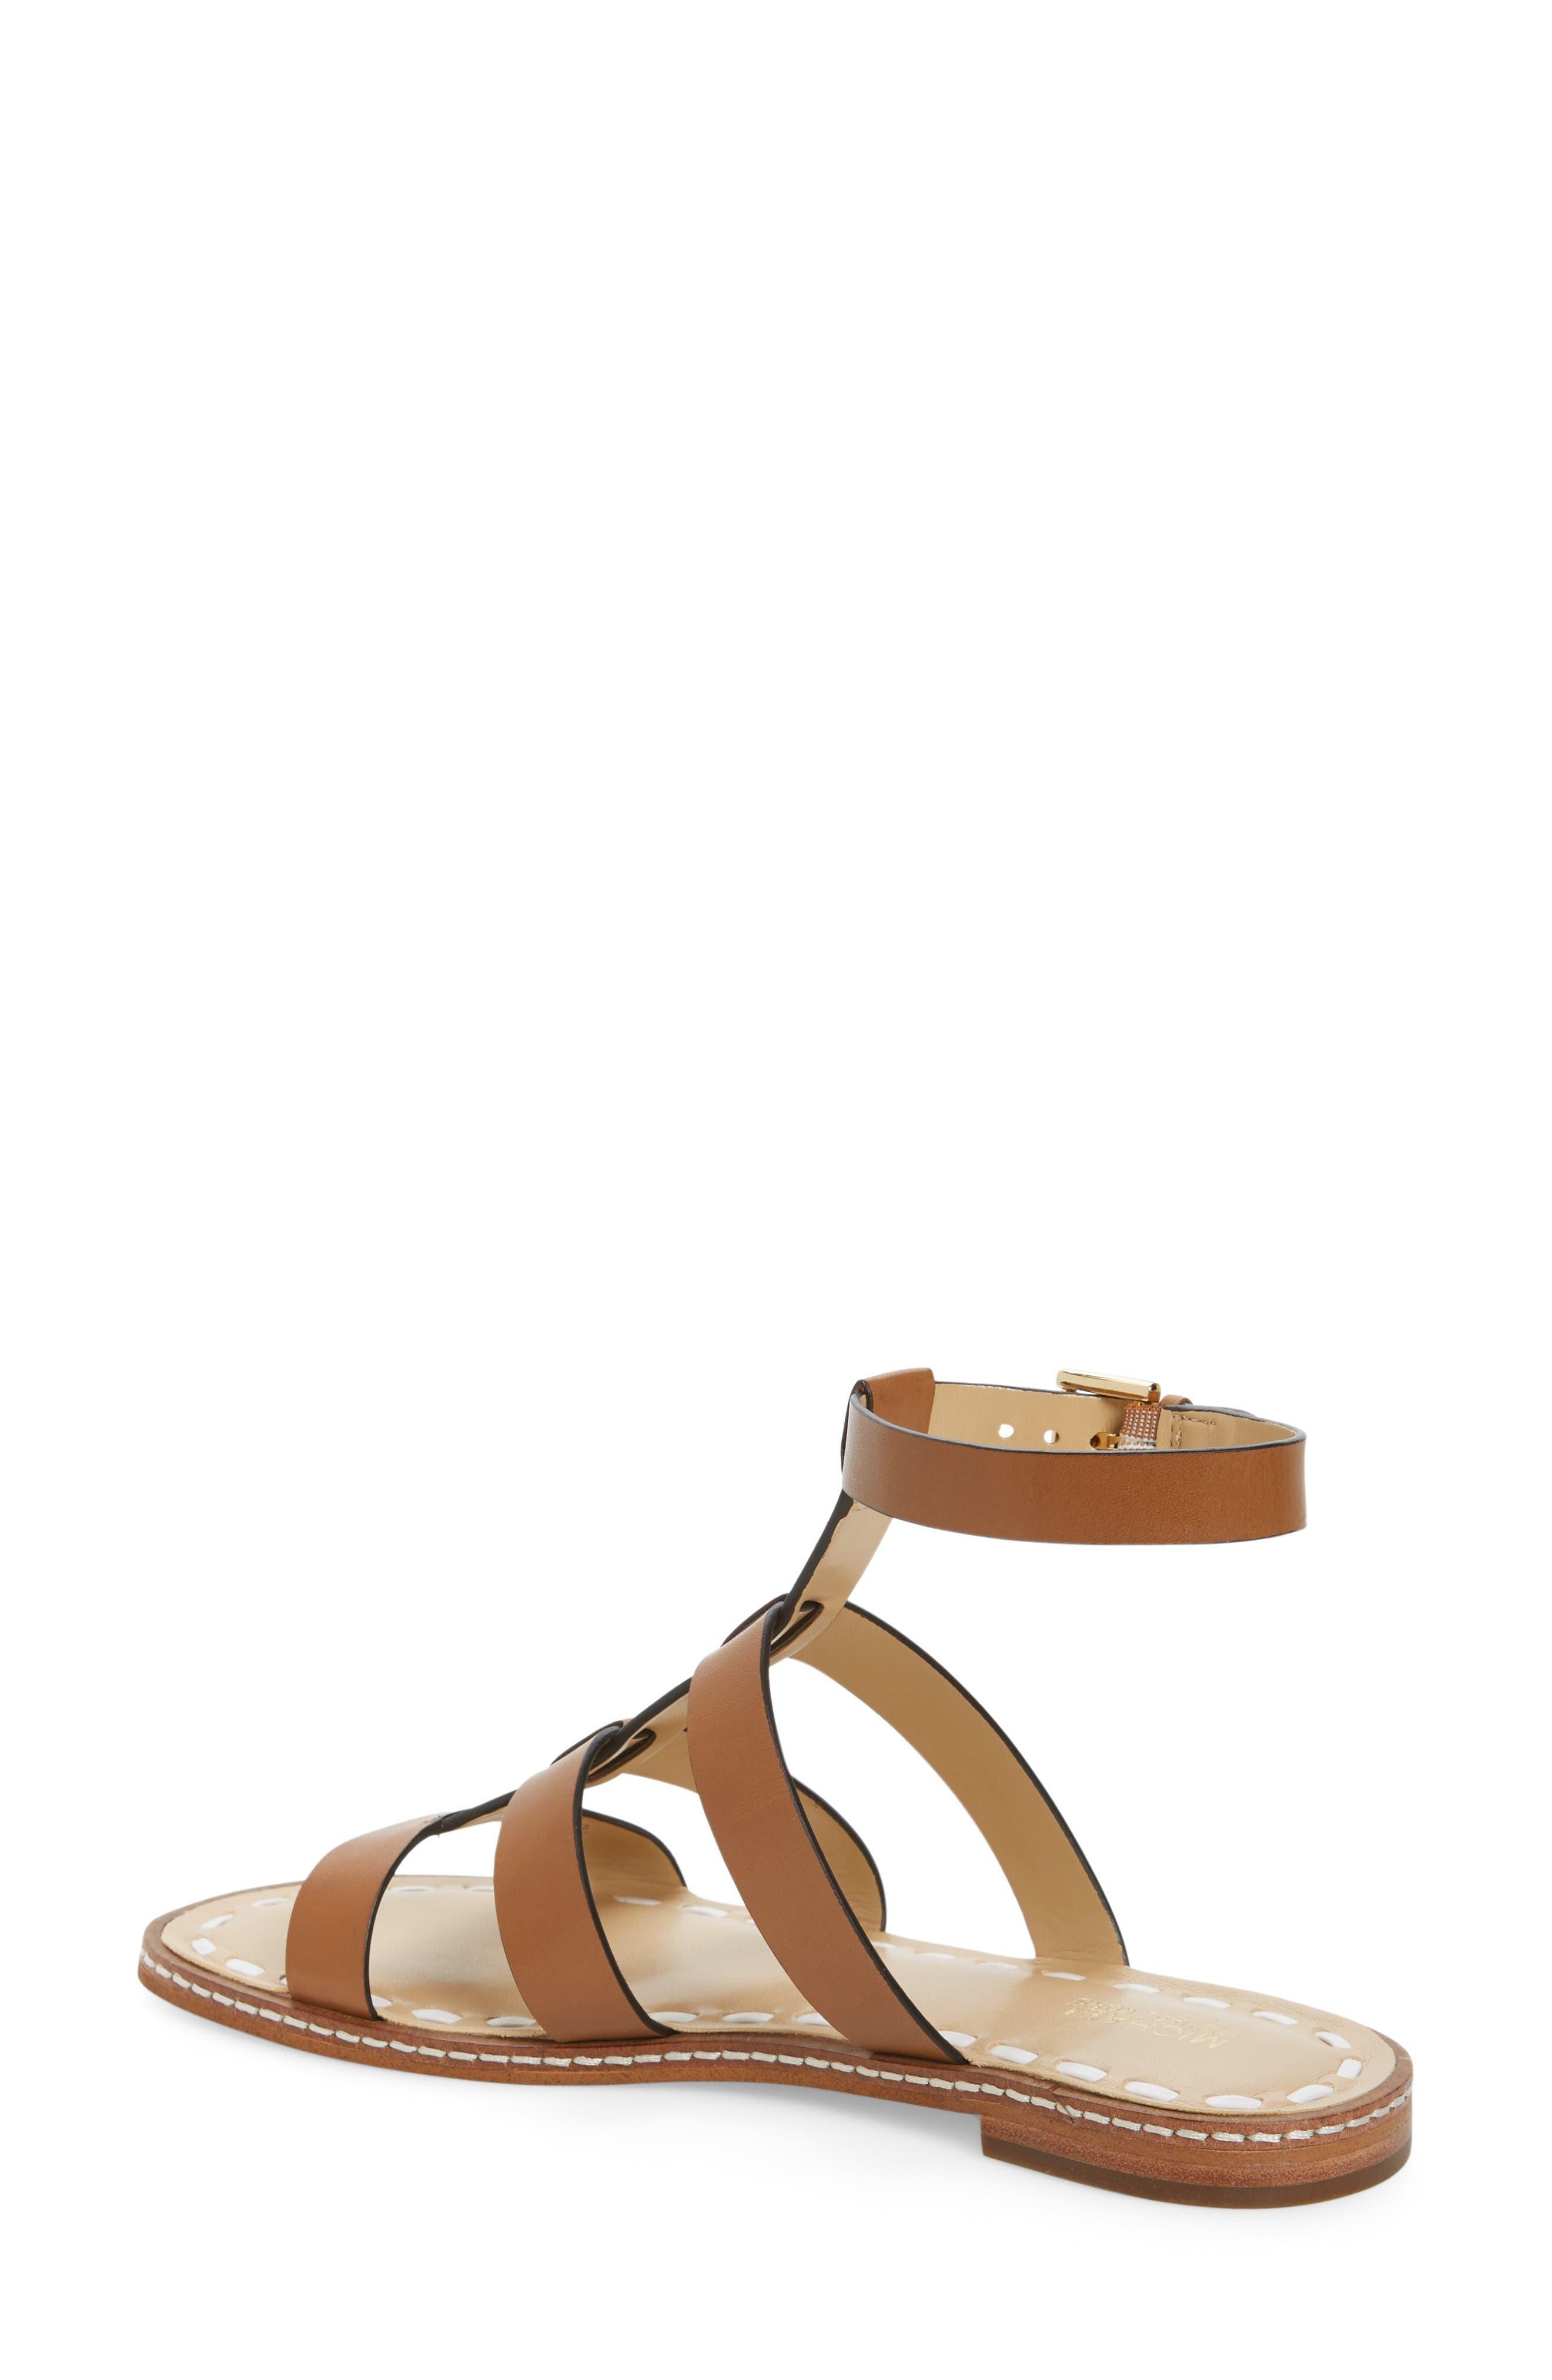 Fallon Gladiator Sandal,                             Alternate thumbnail 2, color,                             Acorn/ White Leather